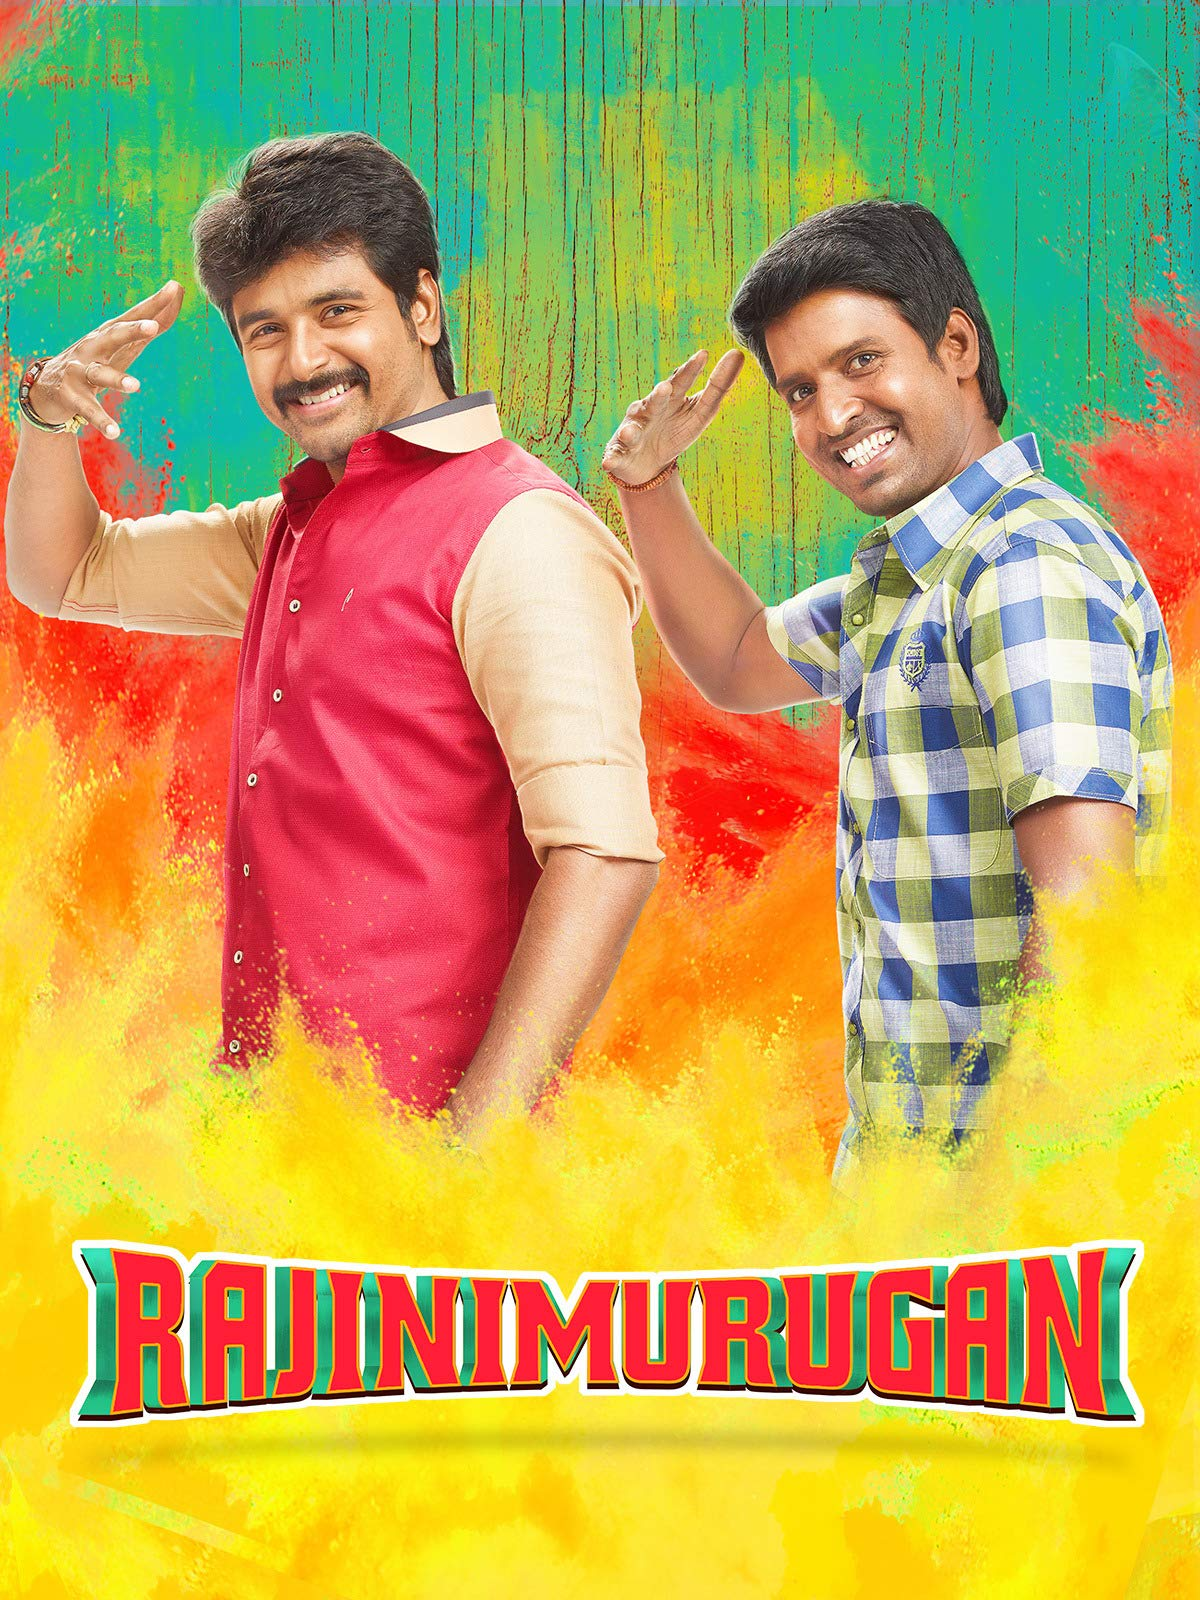 Rajini Murugan (2021) Hindi Dubbed 400MB HDRip 480p Download